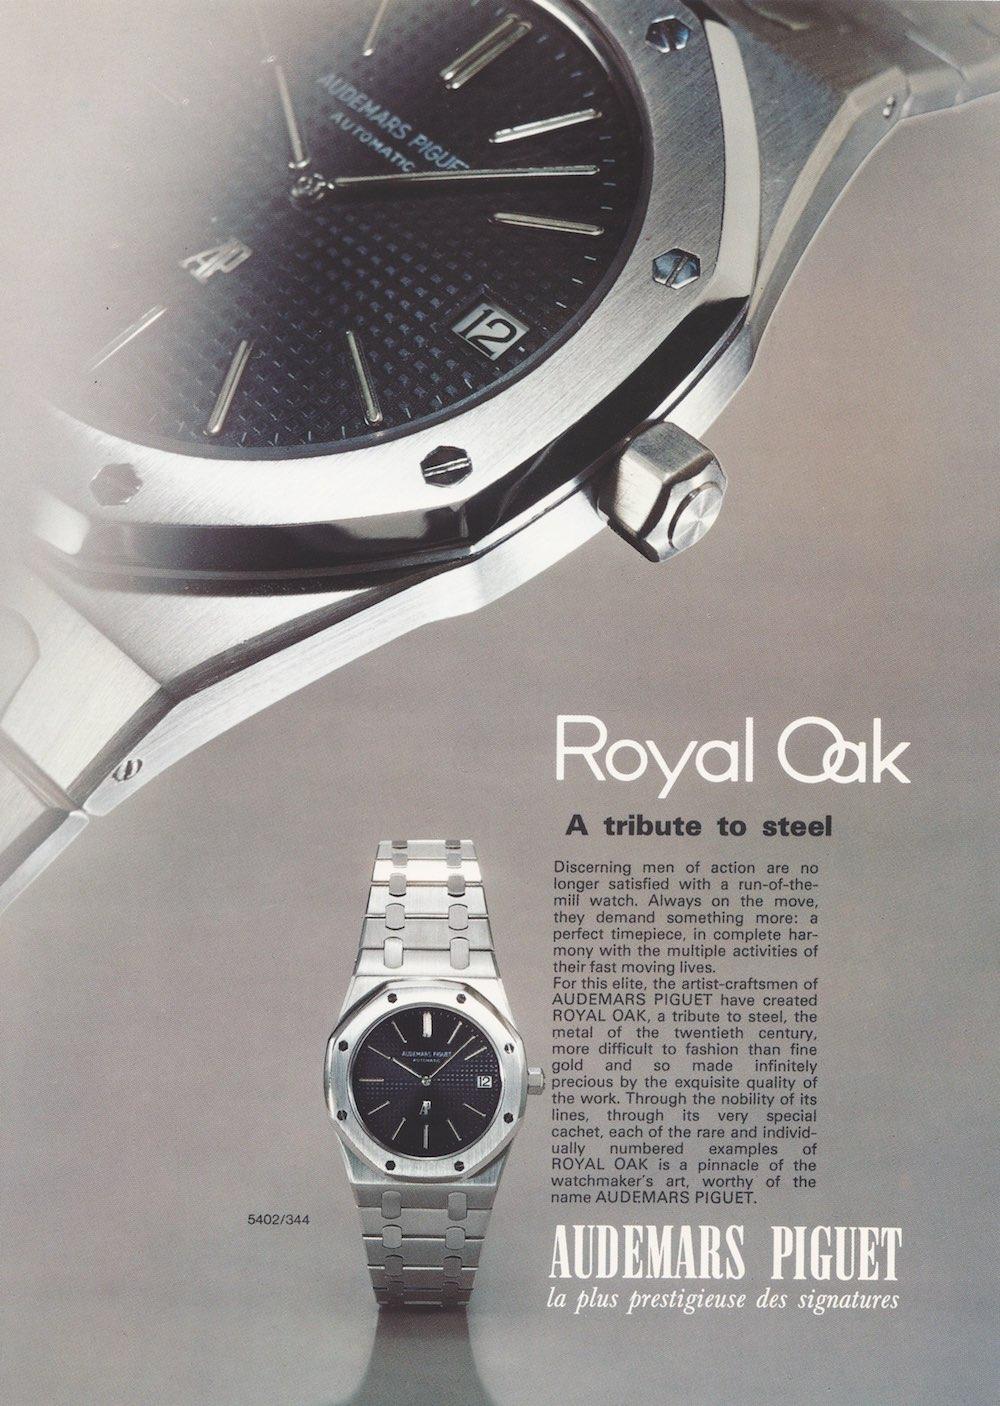 1972-audemars-piguet-royal-oak-original-luxusora-karora-svajci-ora-orasblog-hirdetes.jpeg